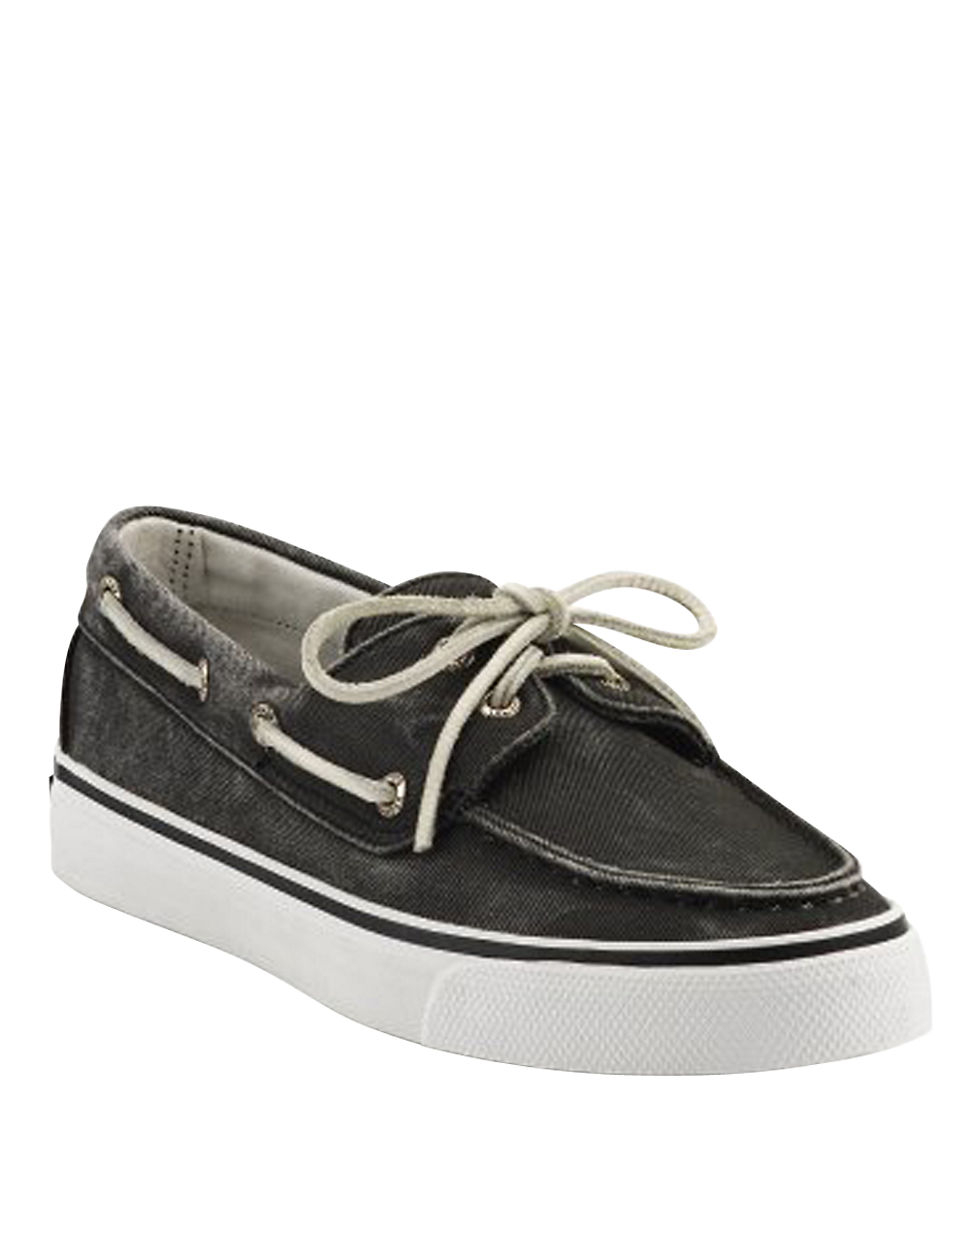 Black Canvas Boat Shoes